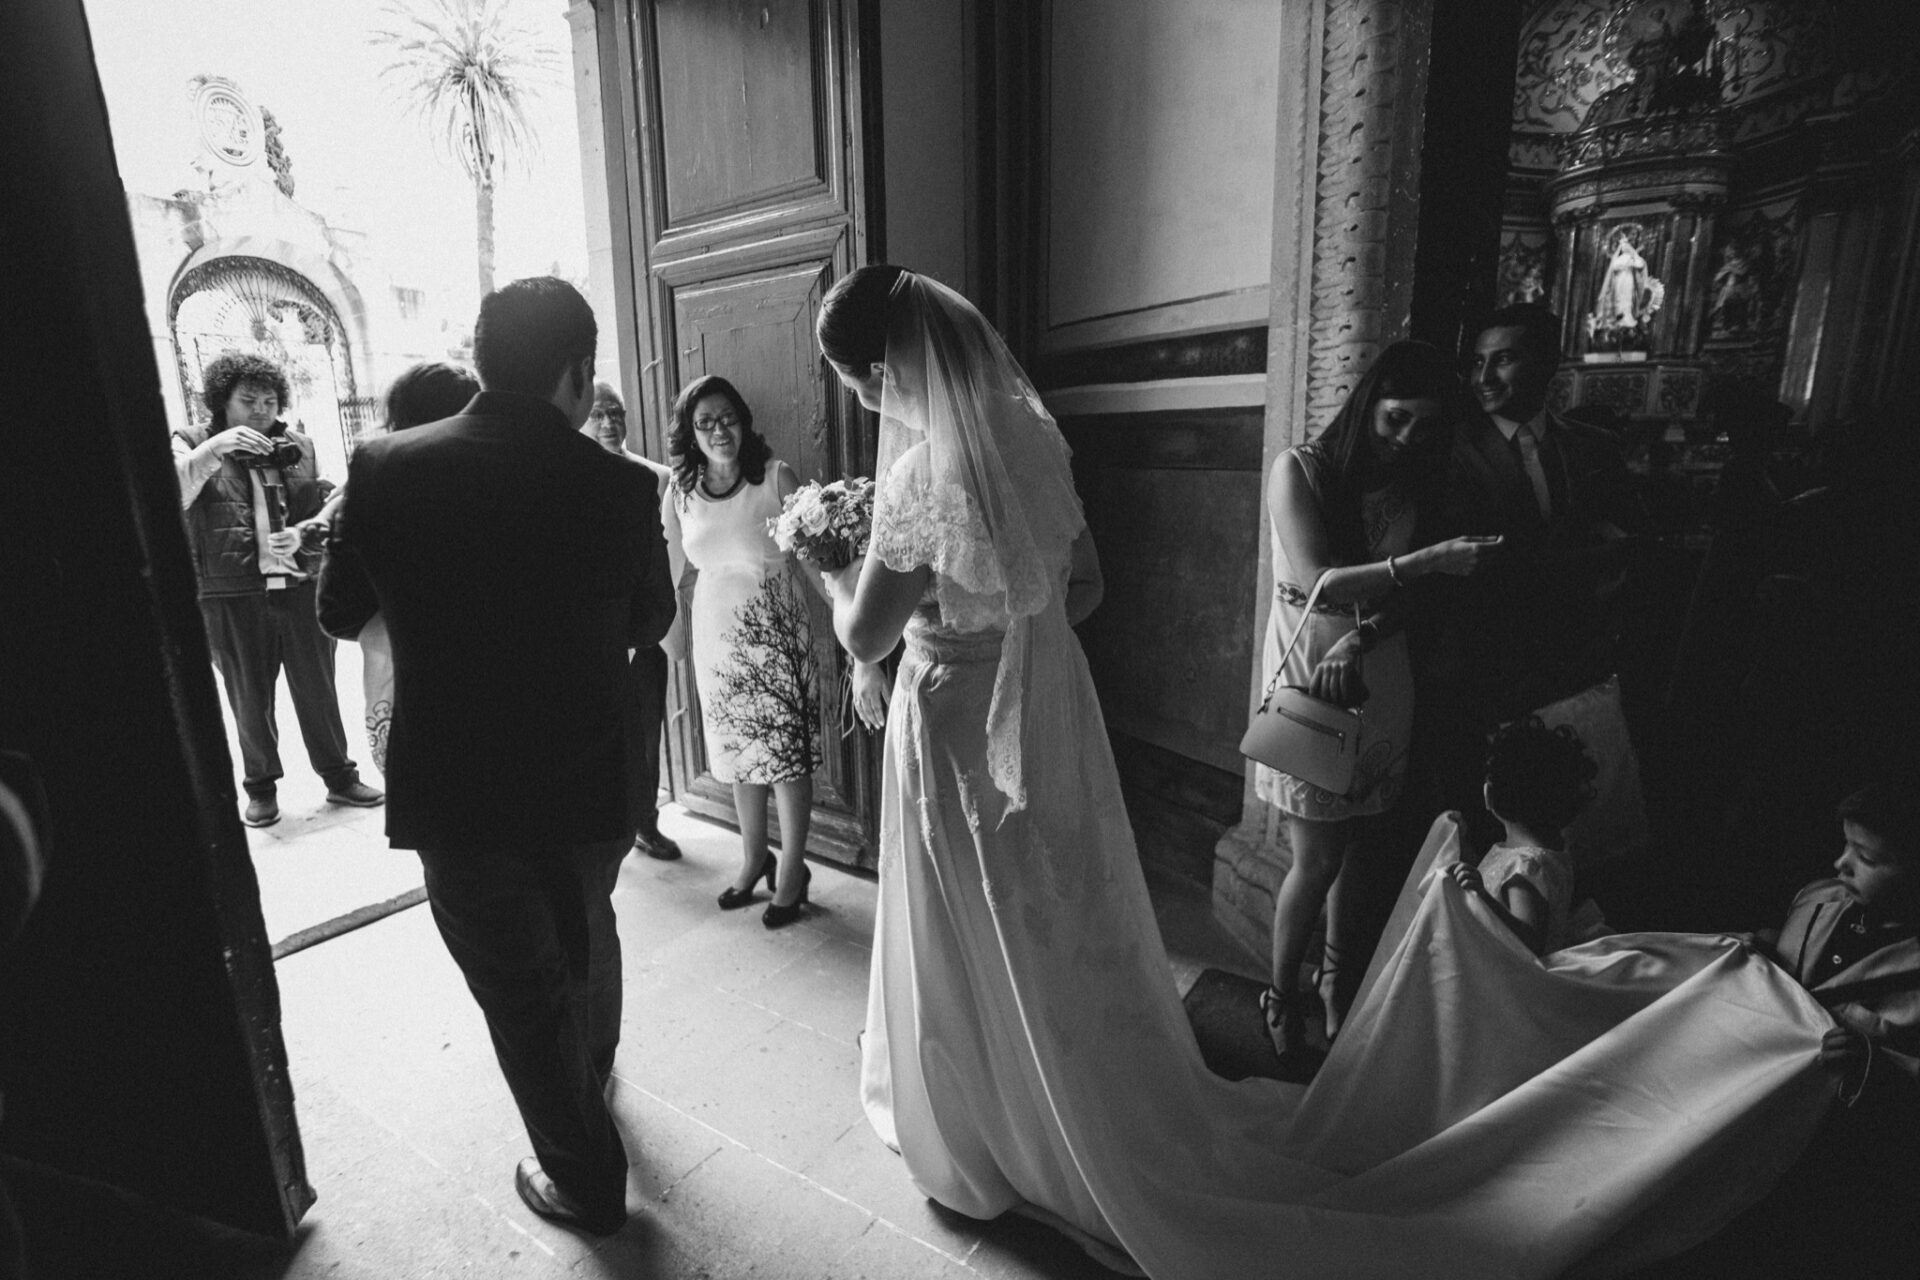 javier_noriega_fotografo_bodas_centro_platero_zacatecas_wedding_photographer17